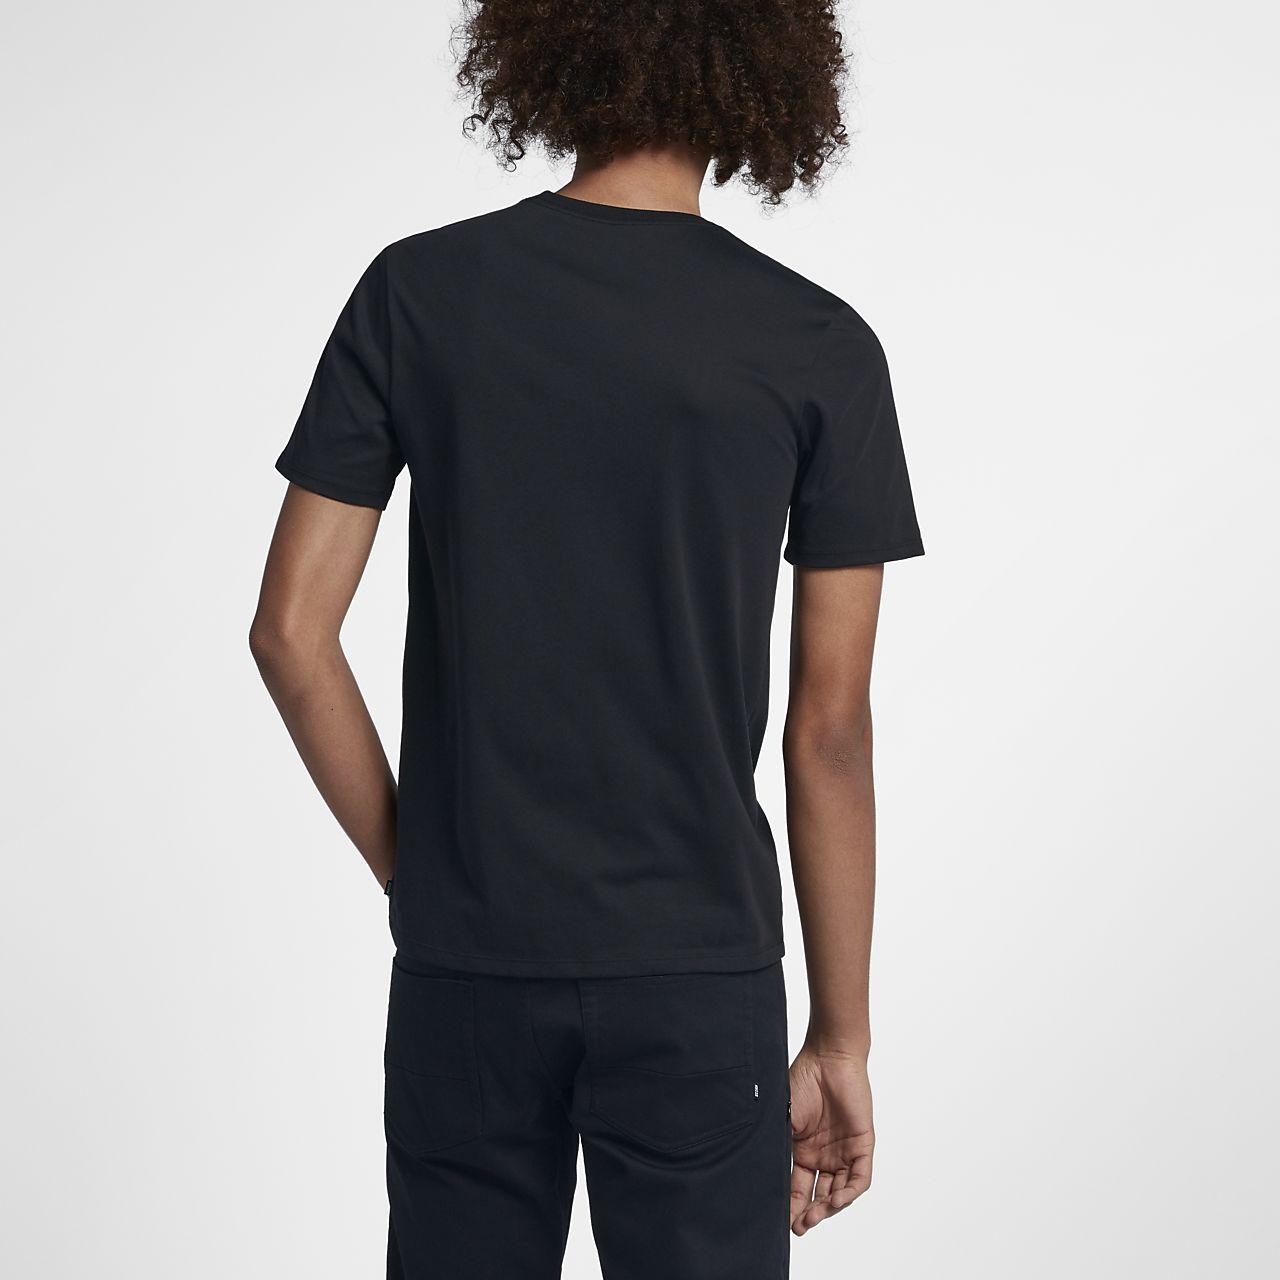 Nike SB Dri-FIT Camiseta de skateboard - Hombre c6ba630c36a41